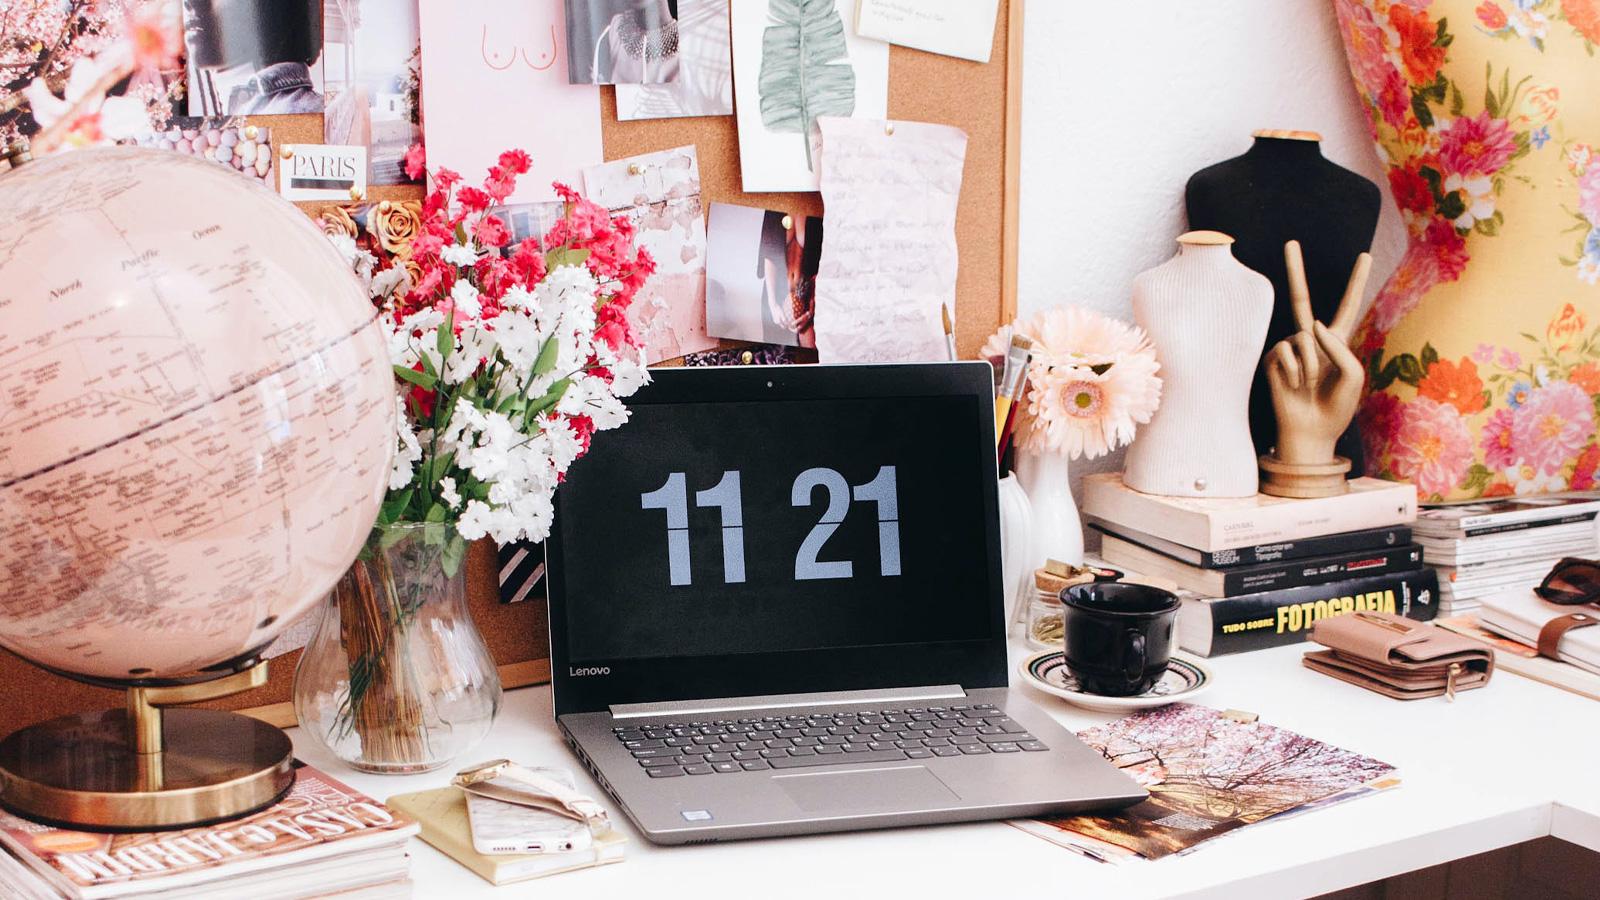 Home-Office-Upgrade mit toller Deko